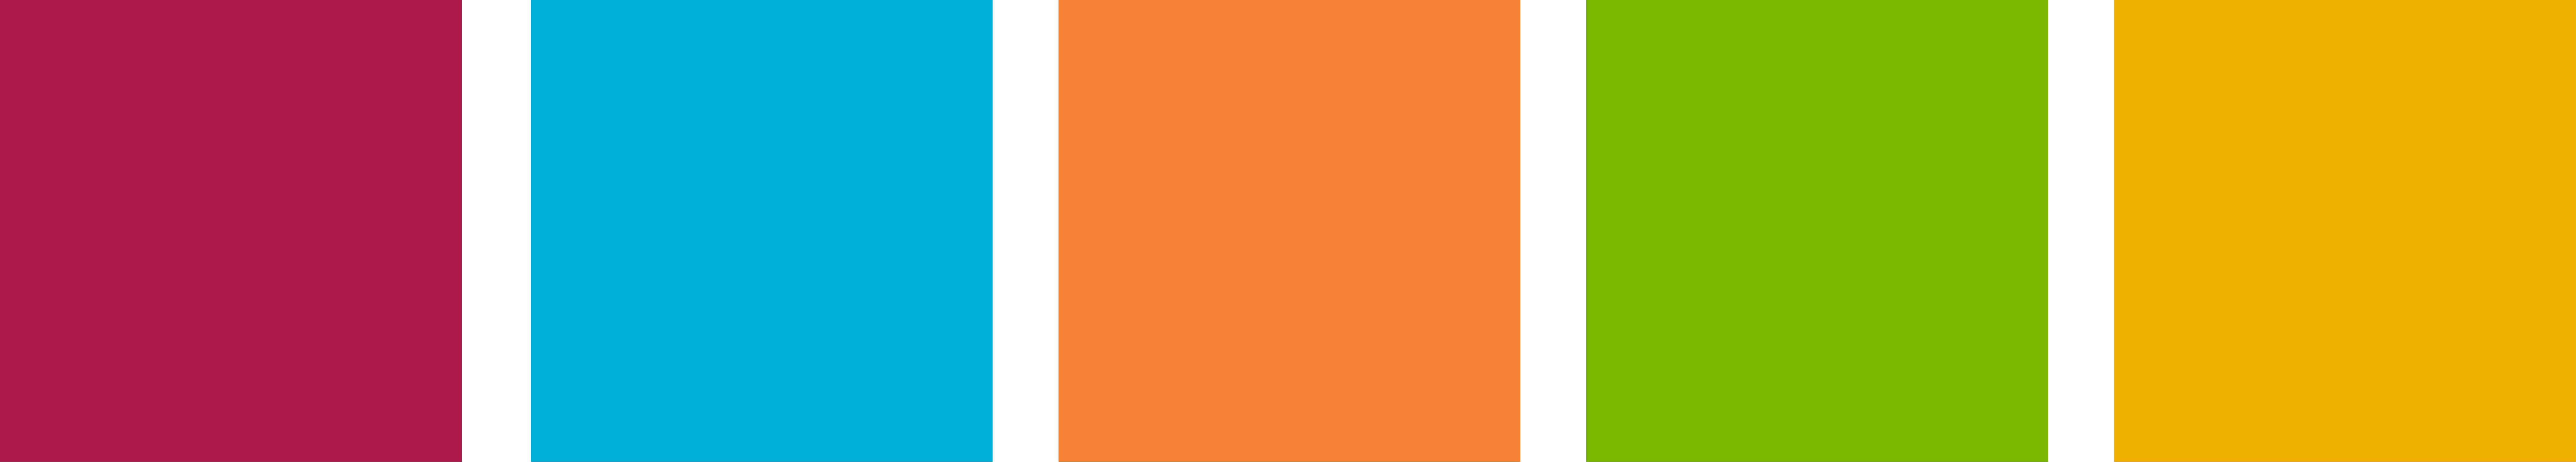 rare secondary color palette